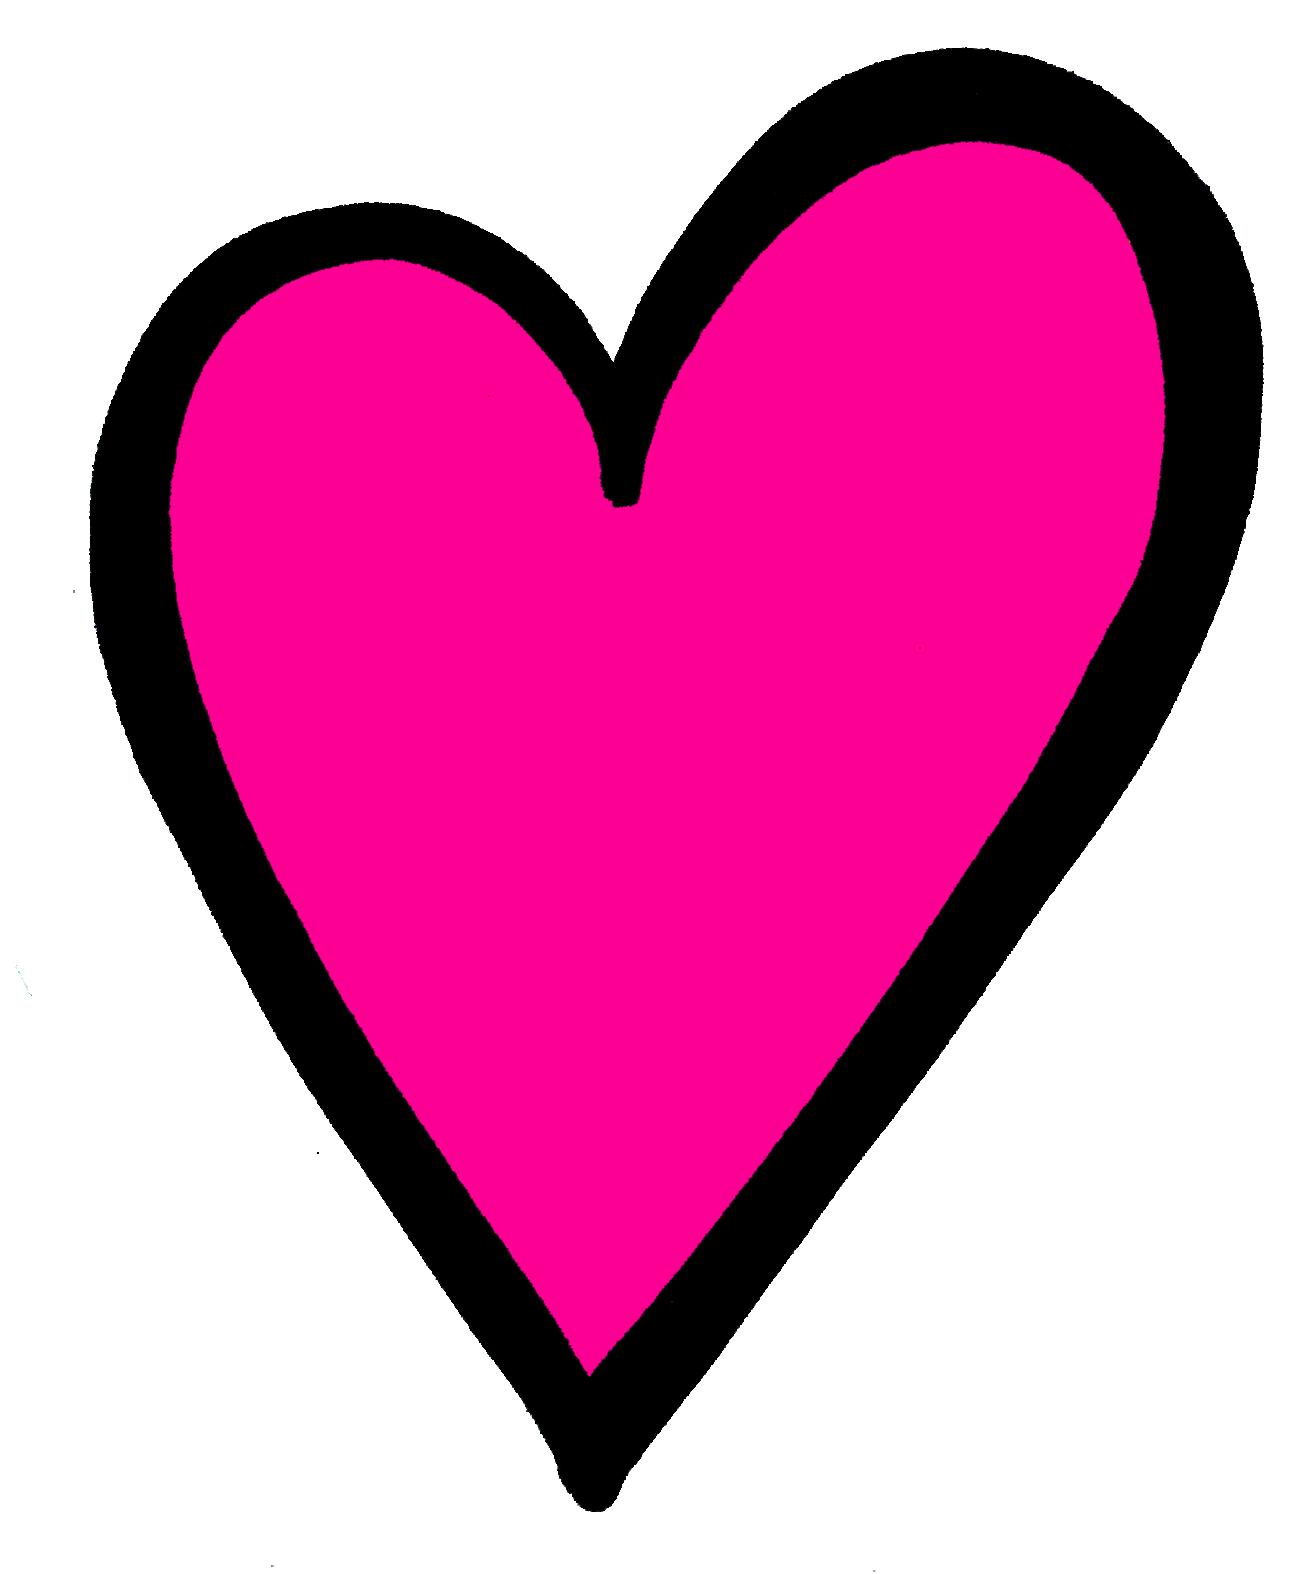 Png Hdpng.com  - Heart, Transparent background PNG HD thumbnail